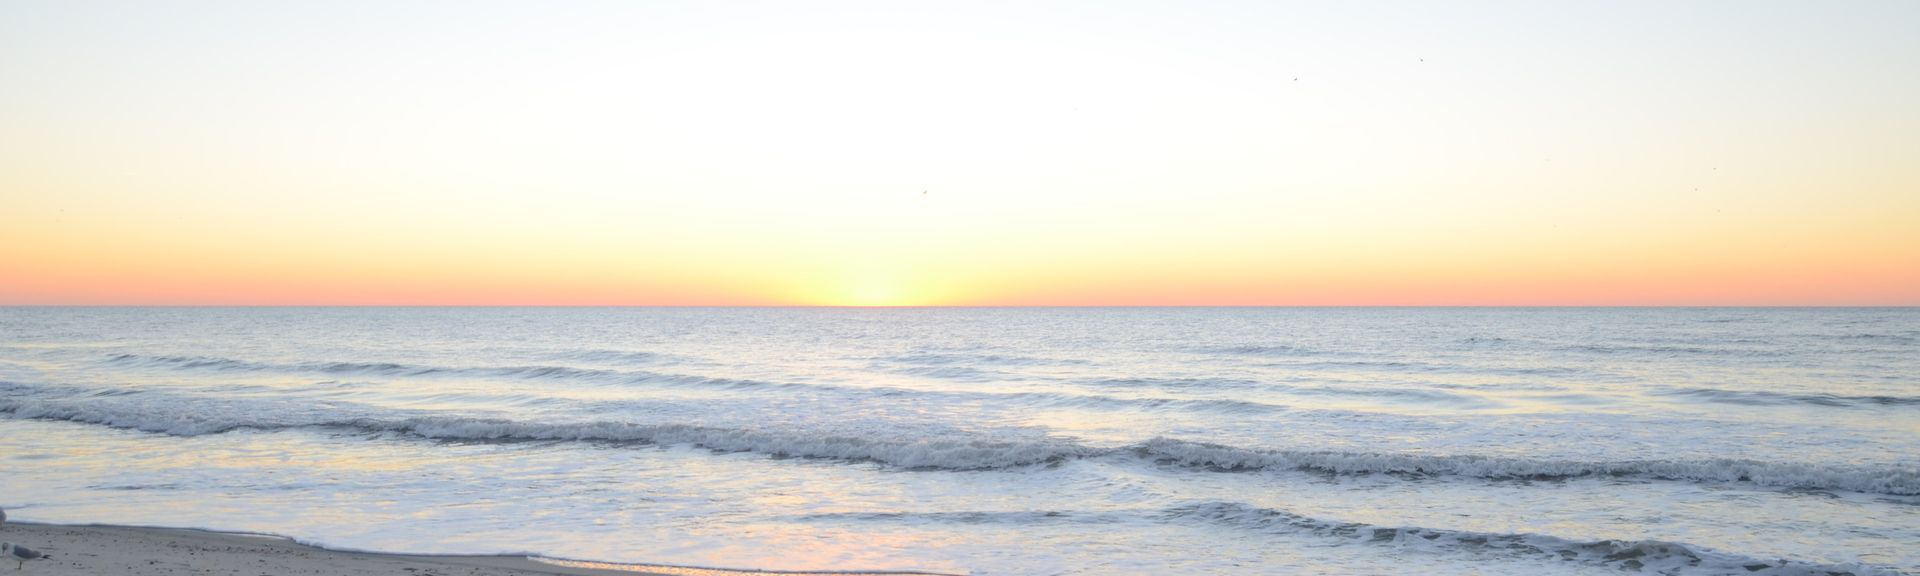 Pelican's Watch, Myrtle Beach, SC, USA